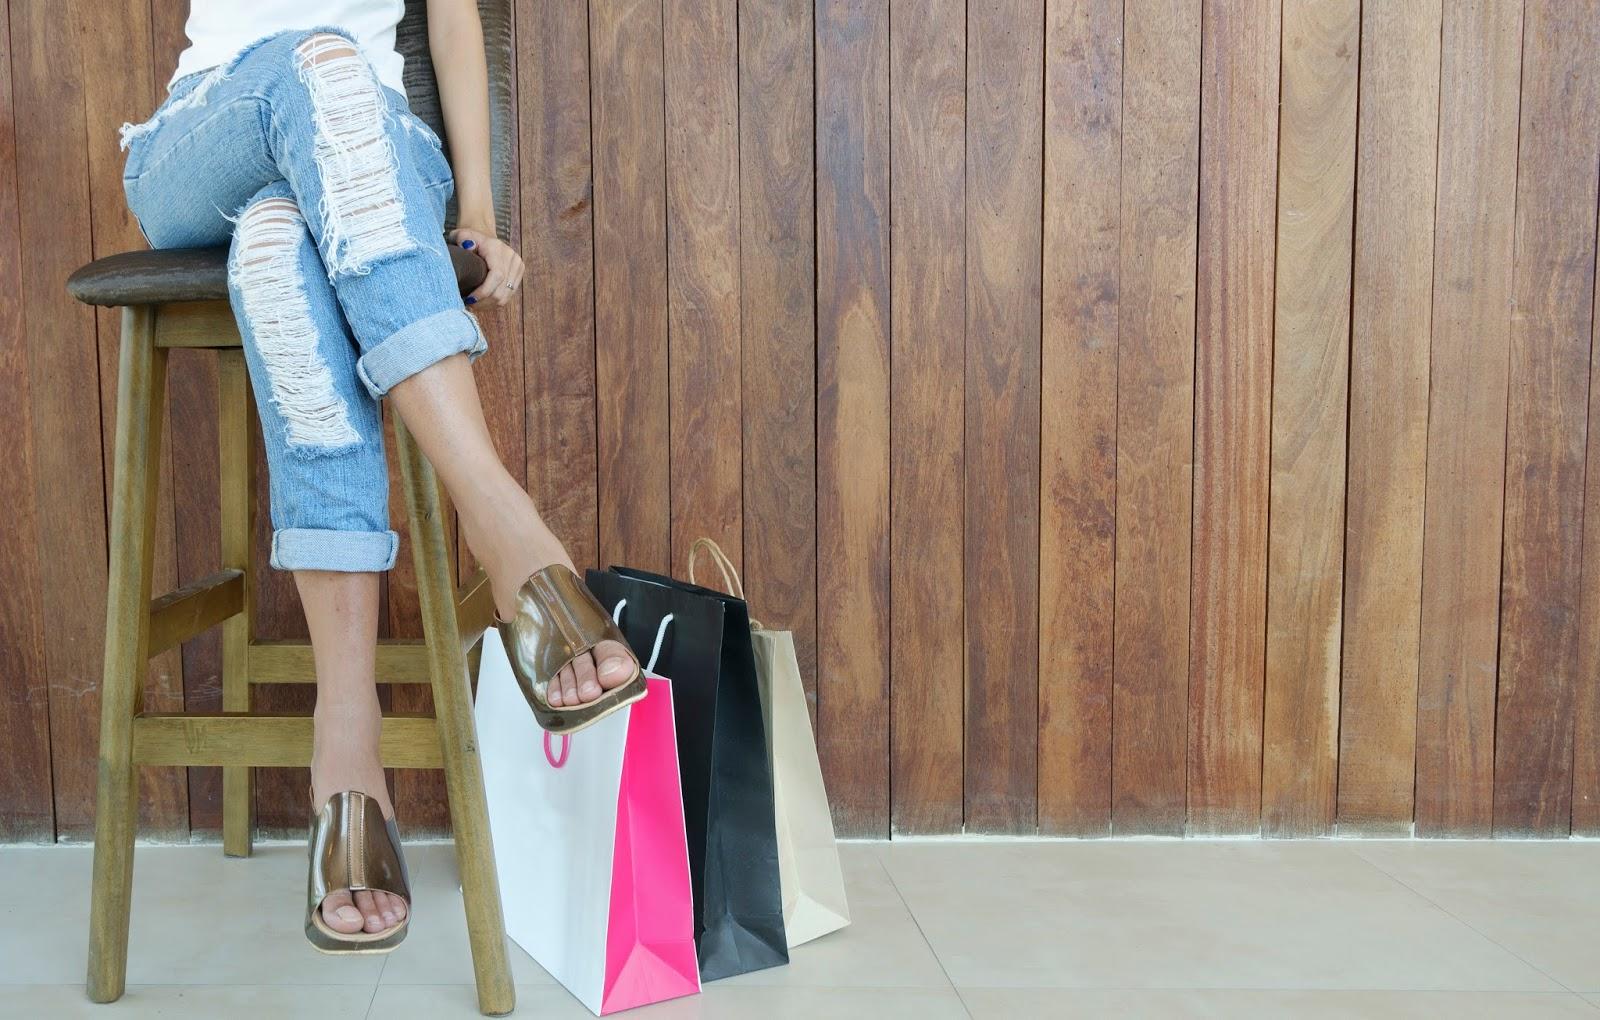 fd6731c66 yadiin  Where to buy cheap clothes in Qatar